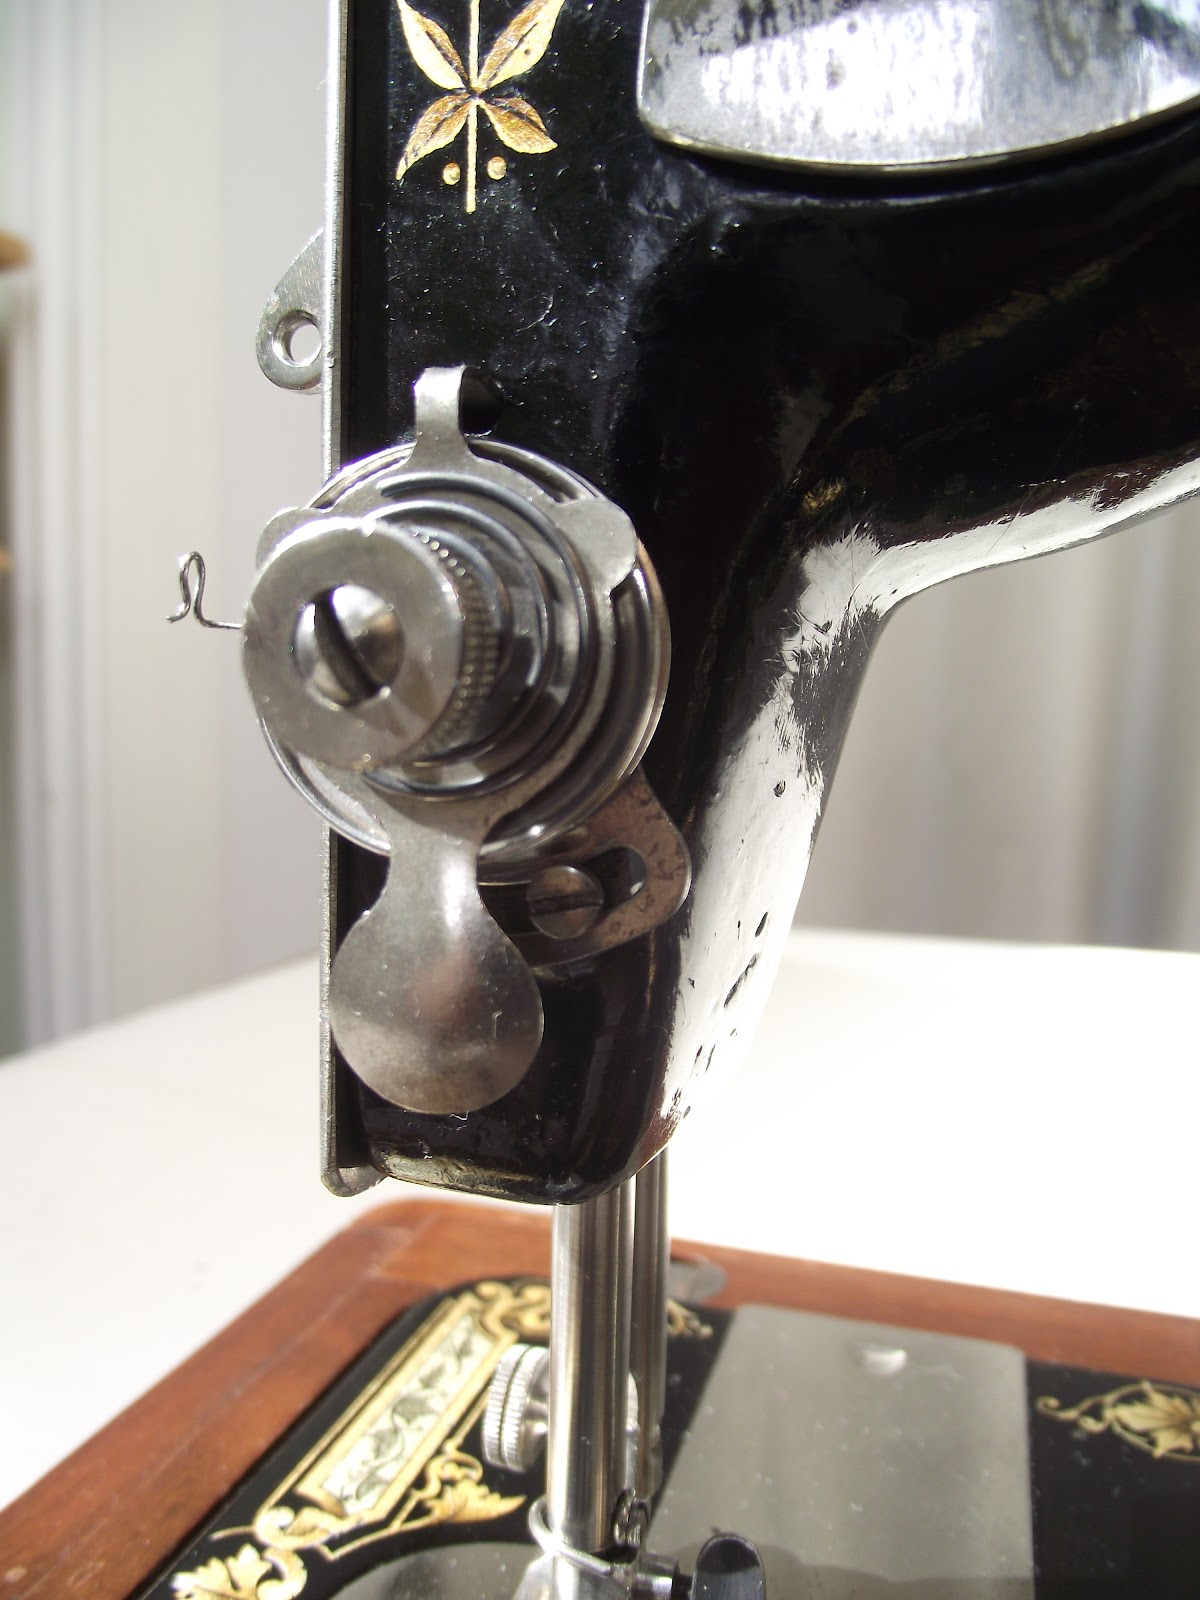 Tension Discs Sewing Machine : tension, discs, sewing, machine, Nähmaschinen, Haushaltsgeräte, VINTAGE, SINGER, SEWING, MACHINE, TENSION, CHECK, SPRING, 27K/28K/127K/128K, Mc-mgmt.com